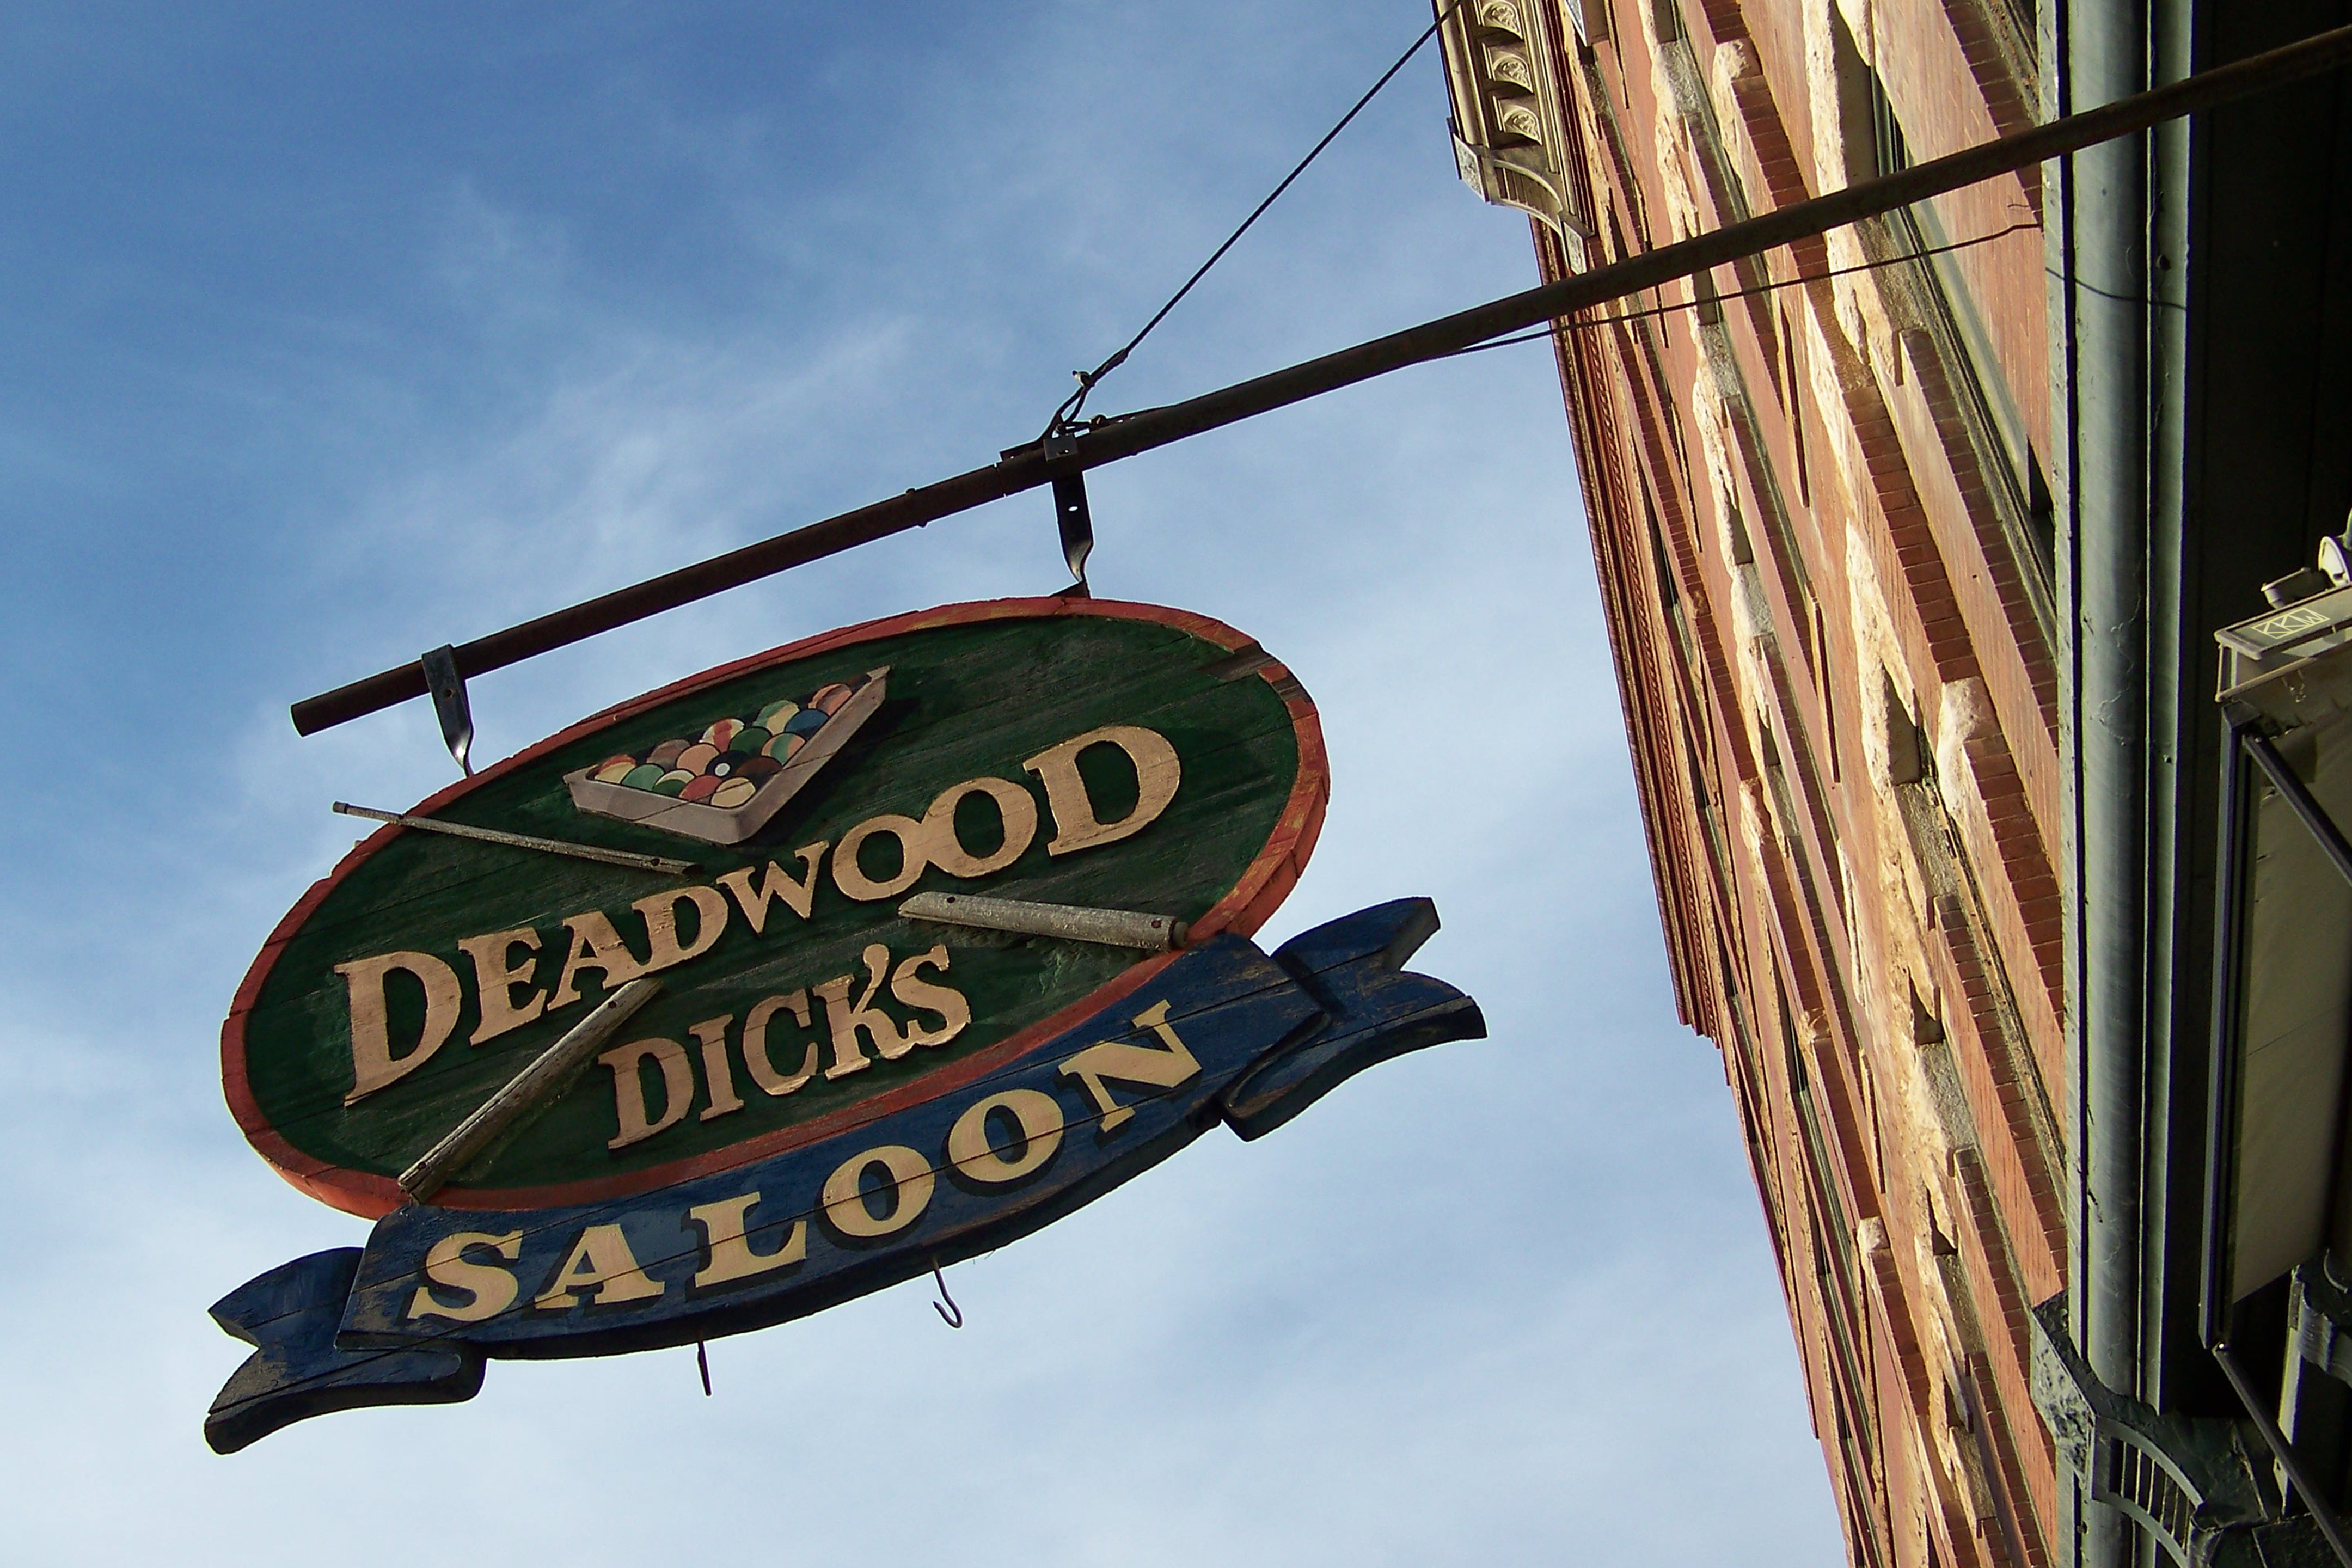 Deadwood Dicks, Deadwood, SD 8/23/2013 5:26PM by Crigger